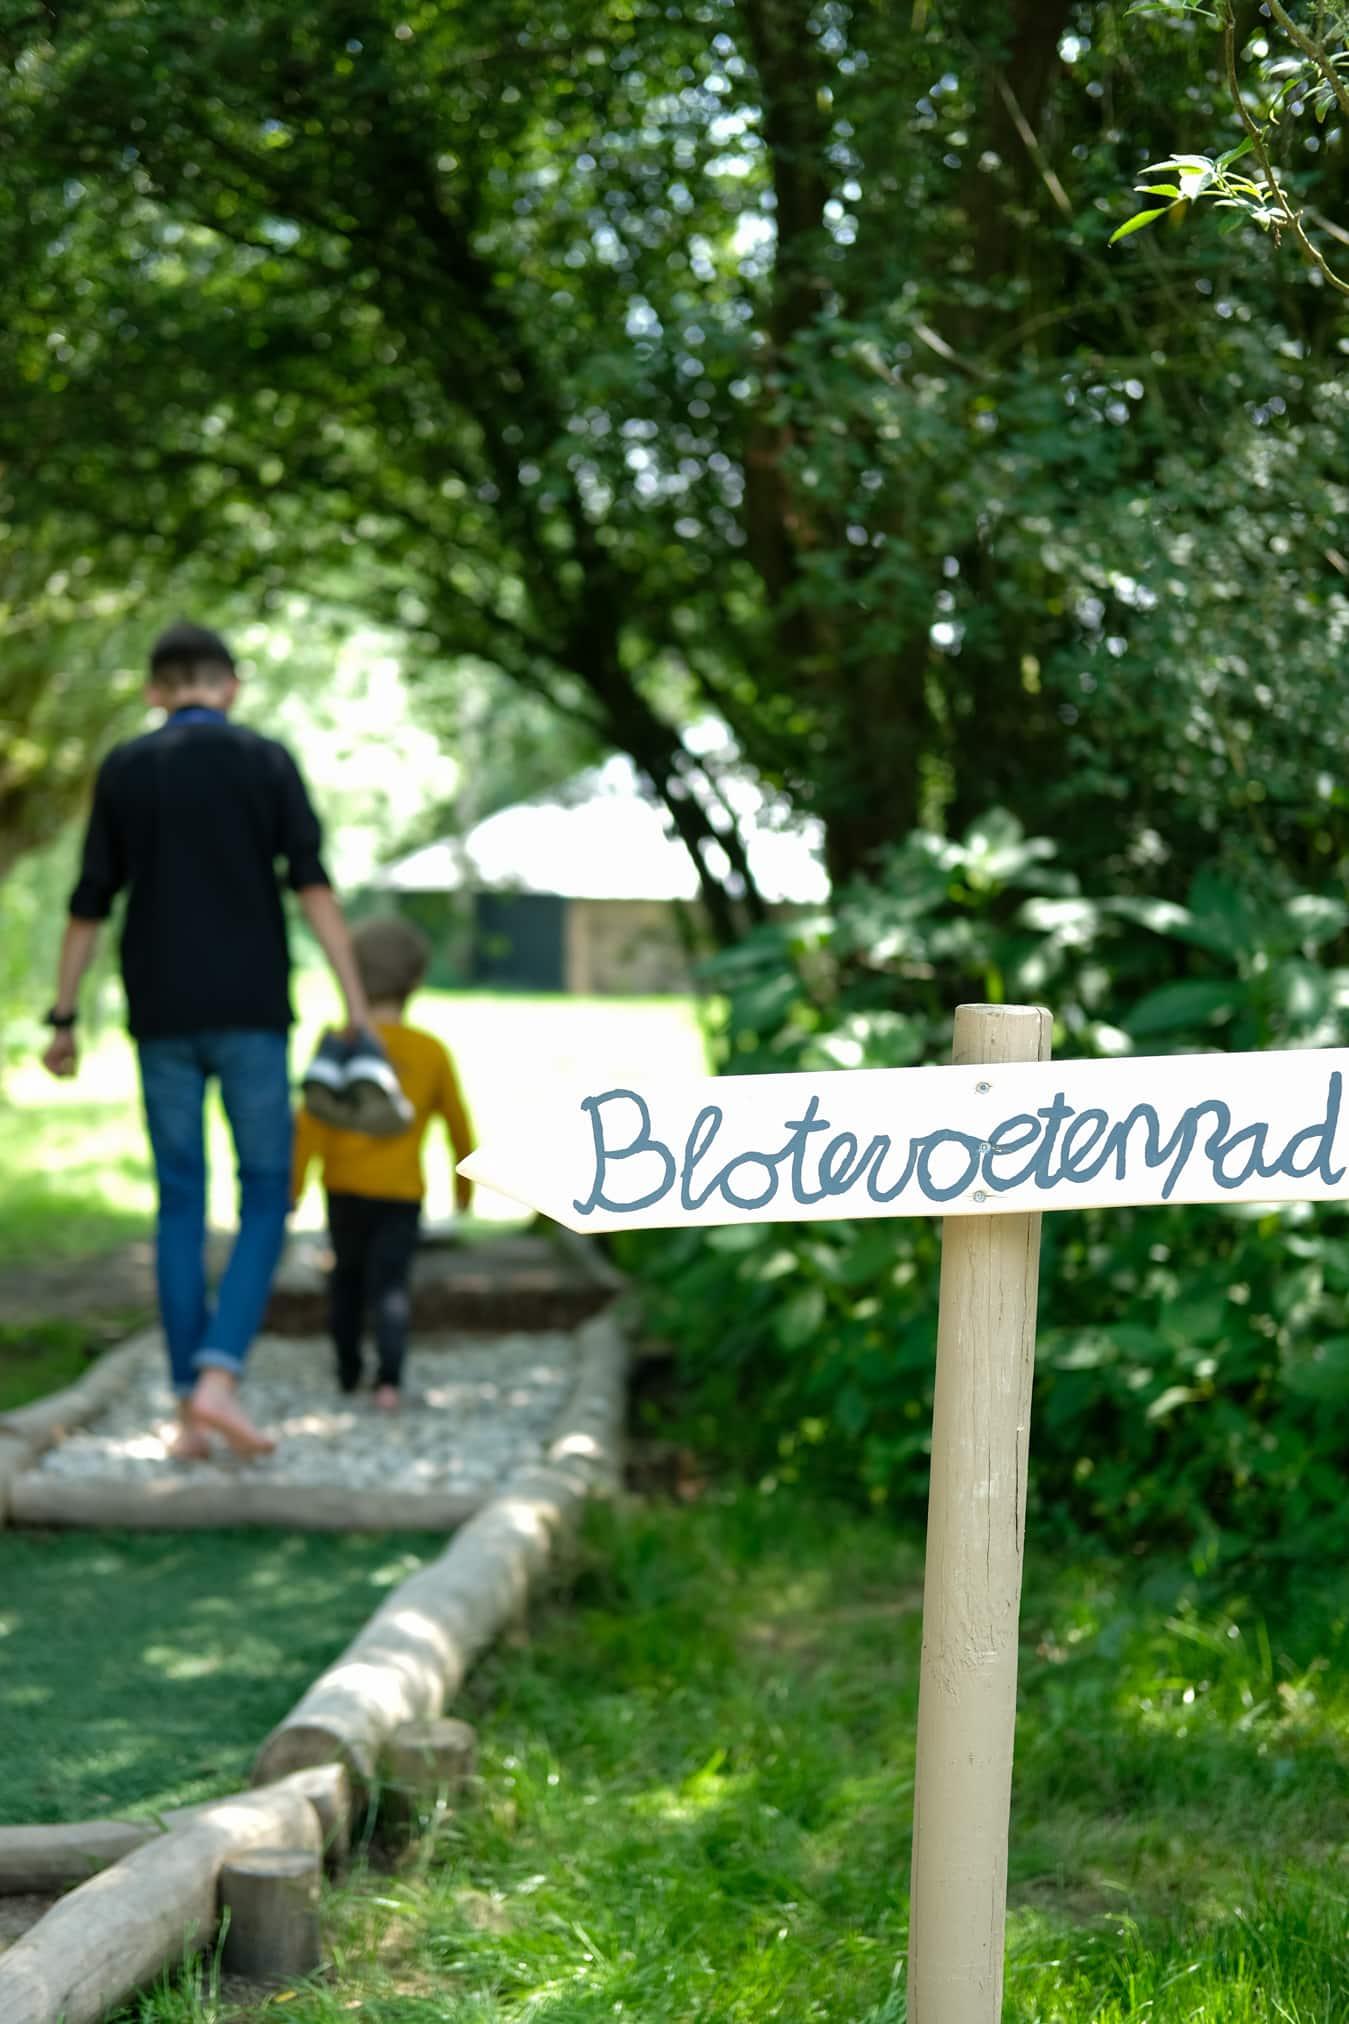 blotevoetenpad zuid holland